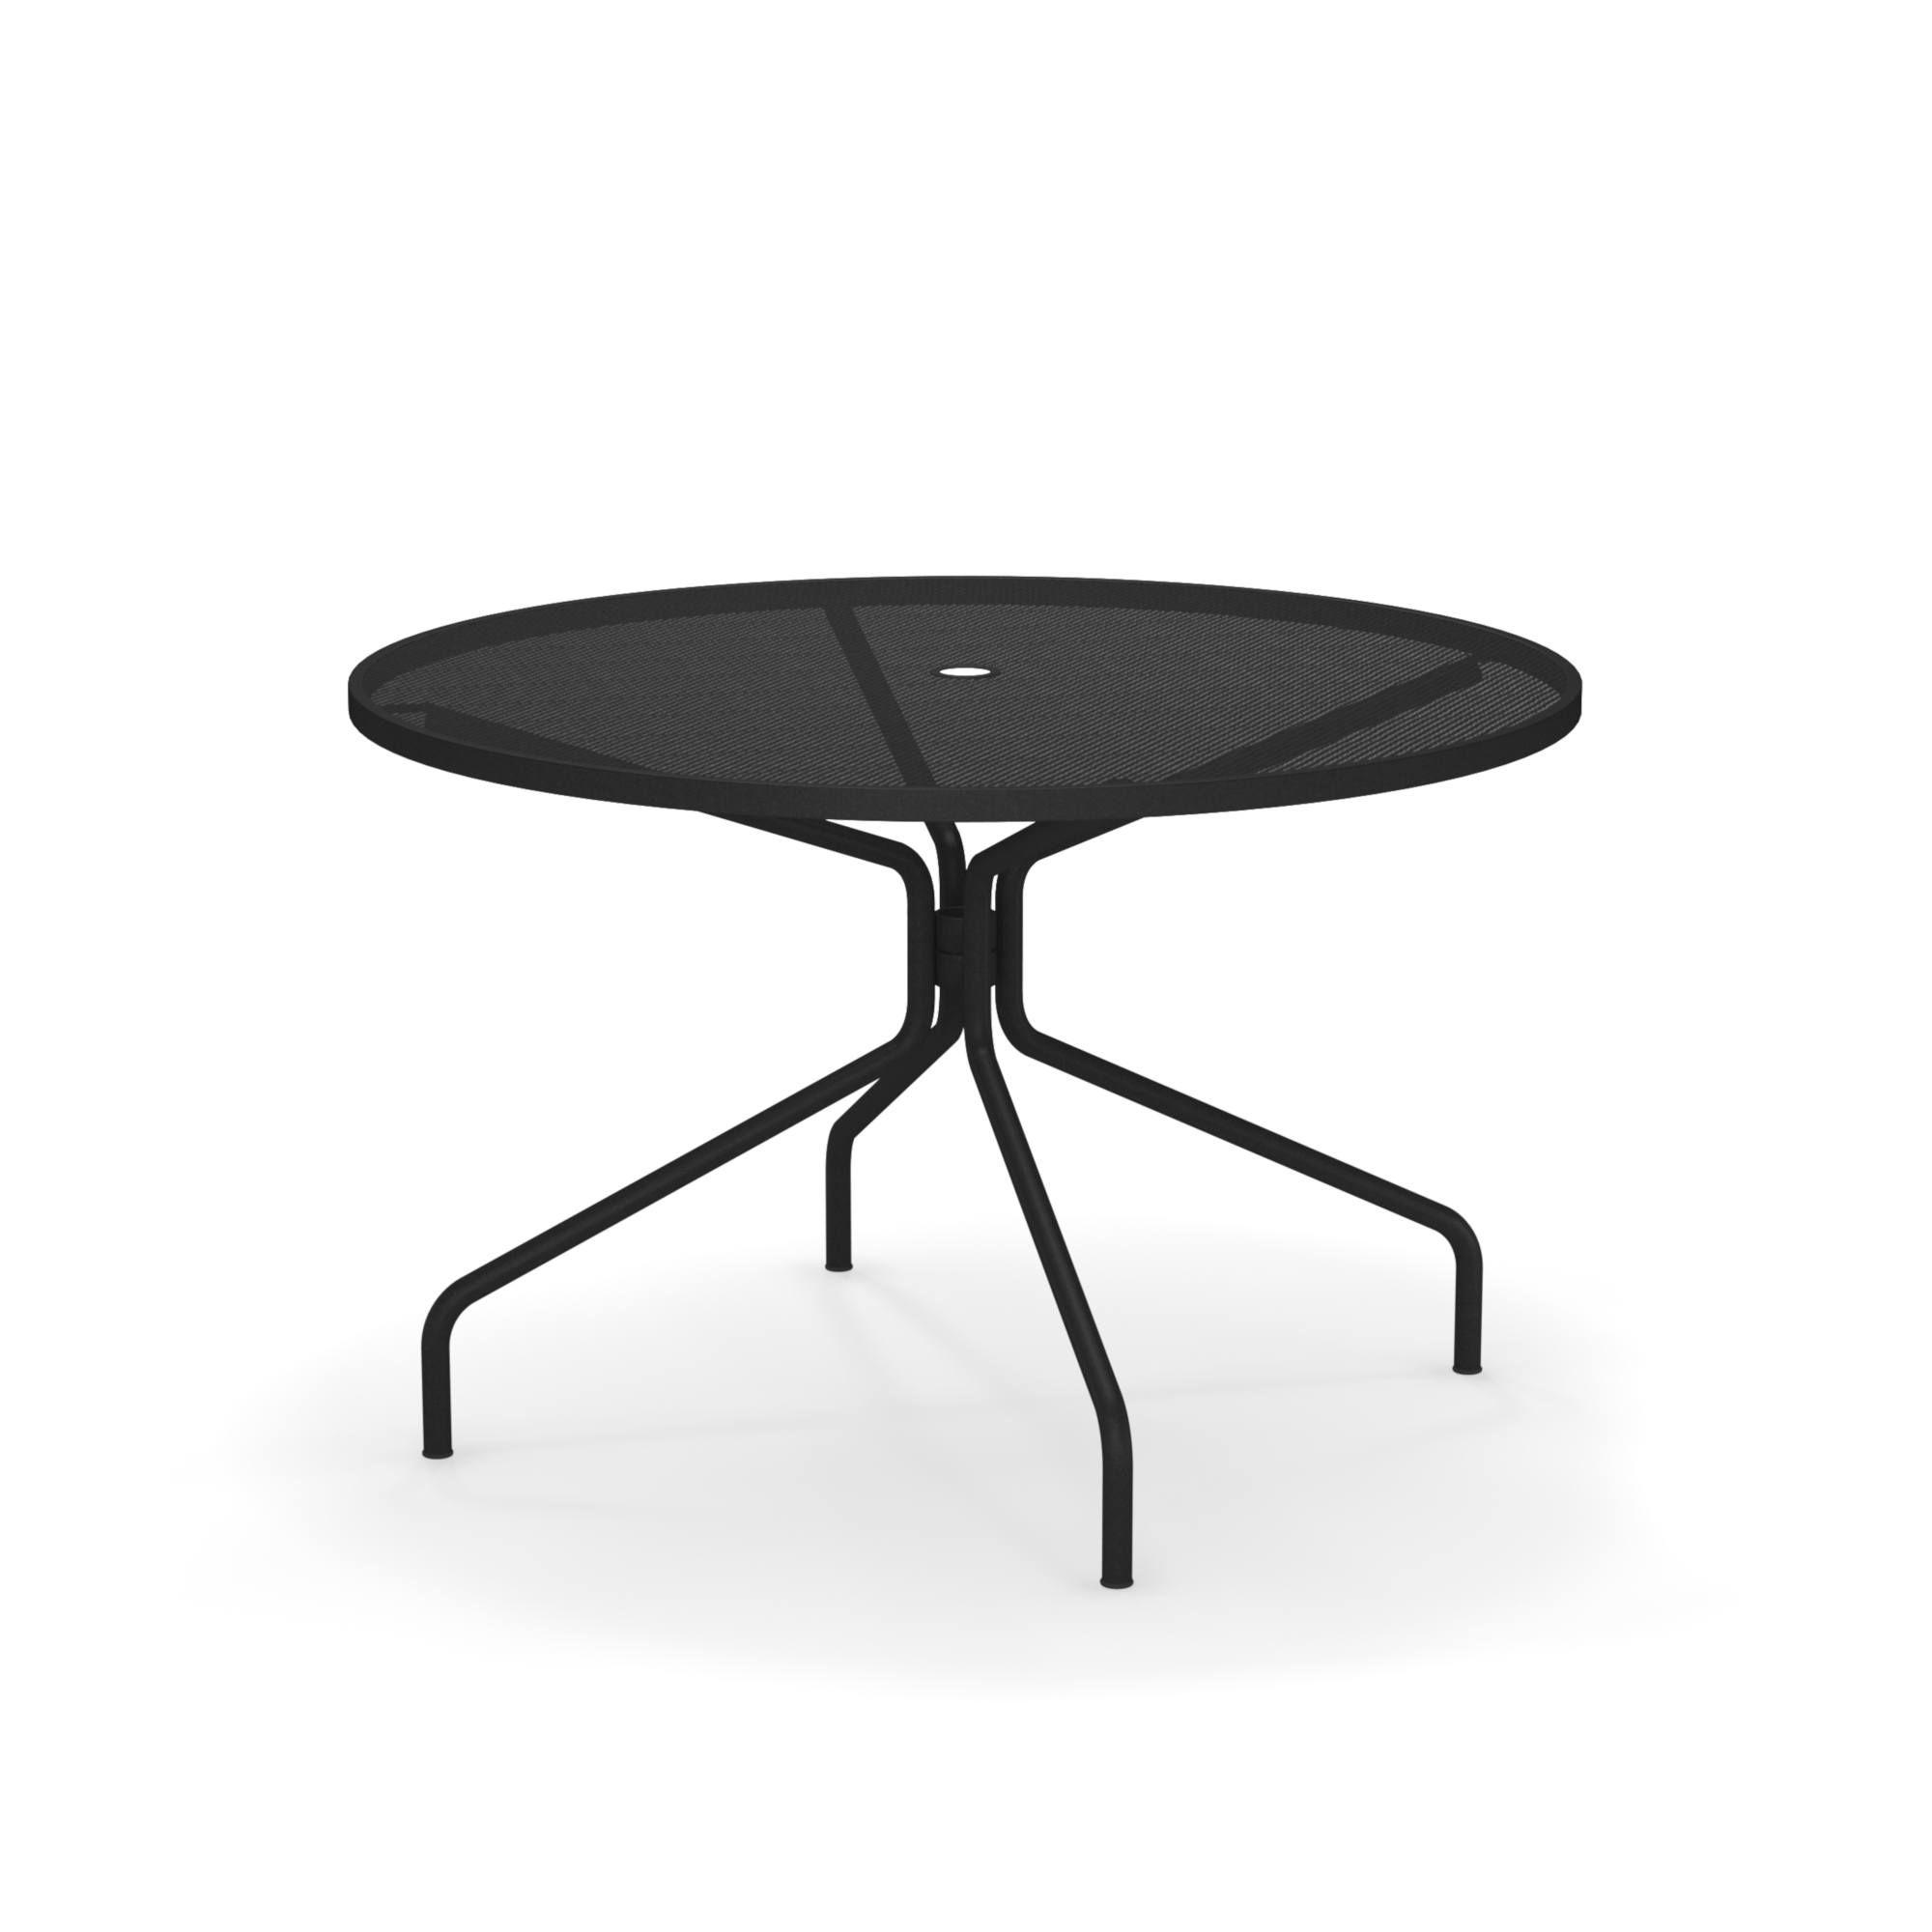 emuamericas, llc 805-24 table, outdoor